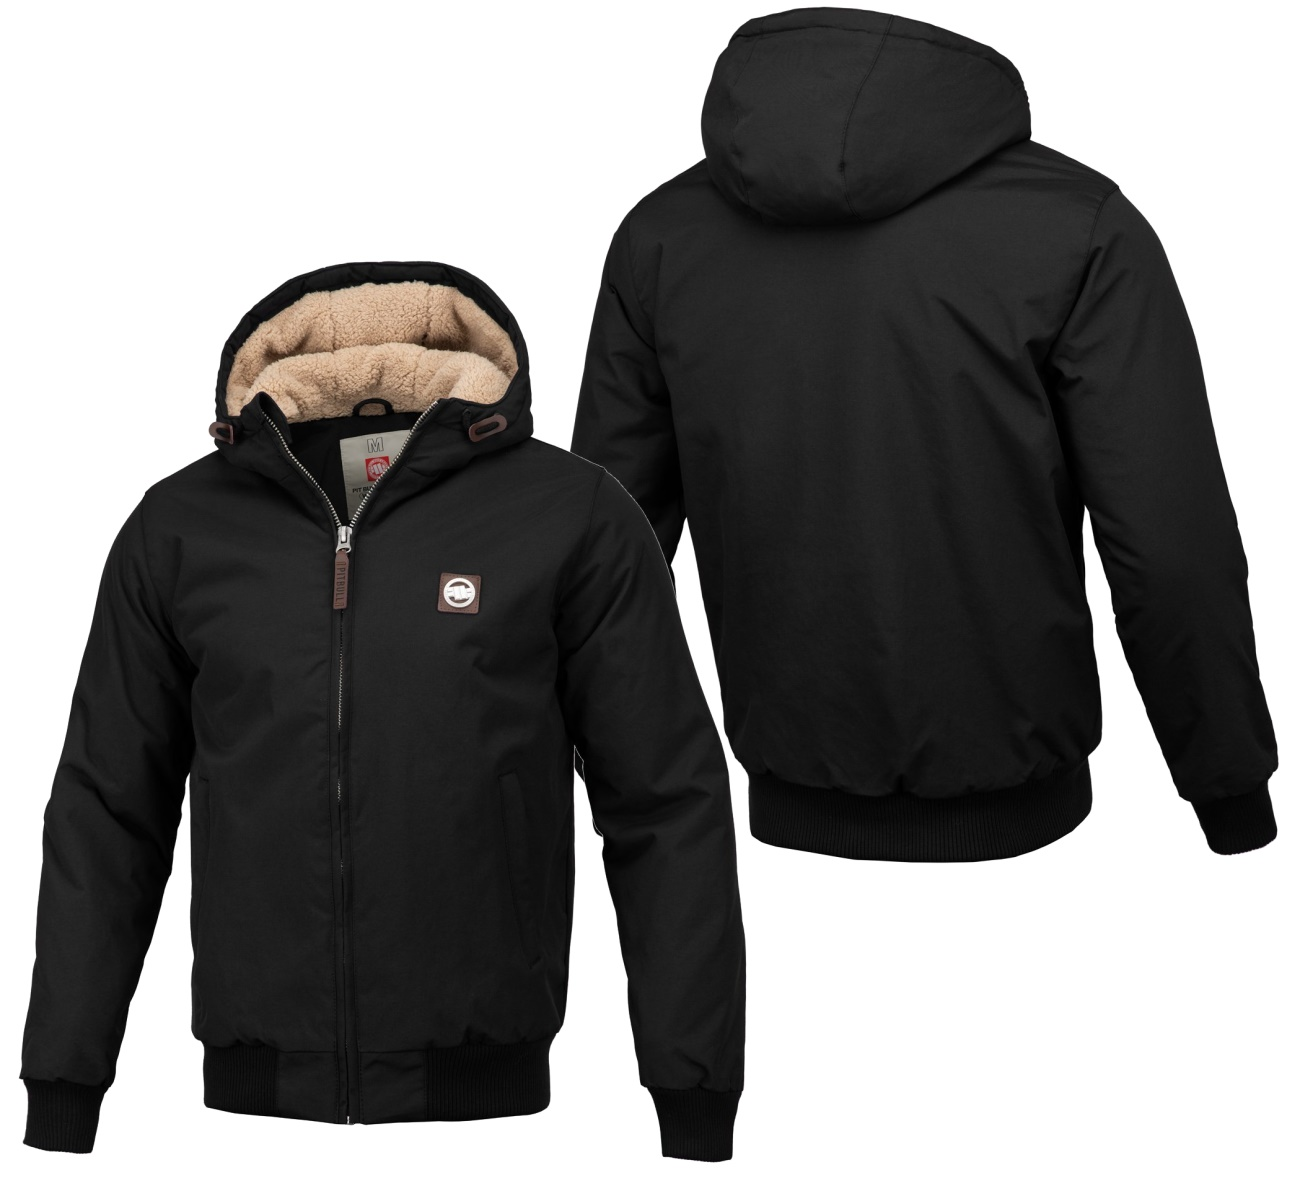 Pit Bull West Coast Sherpa Hooded Jacket Elkwood 3